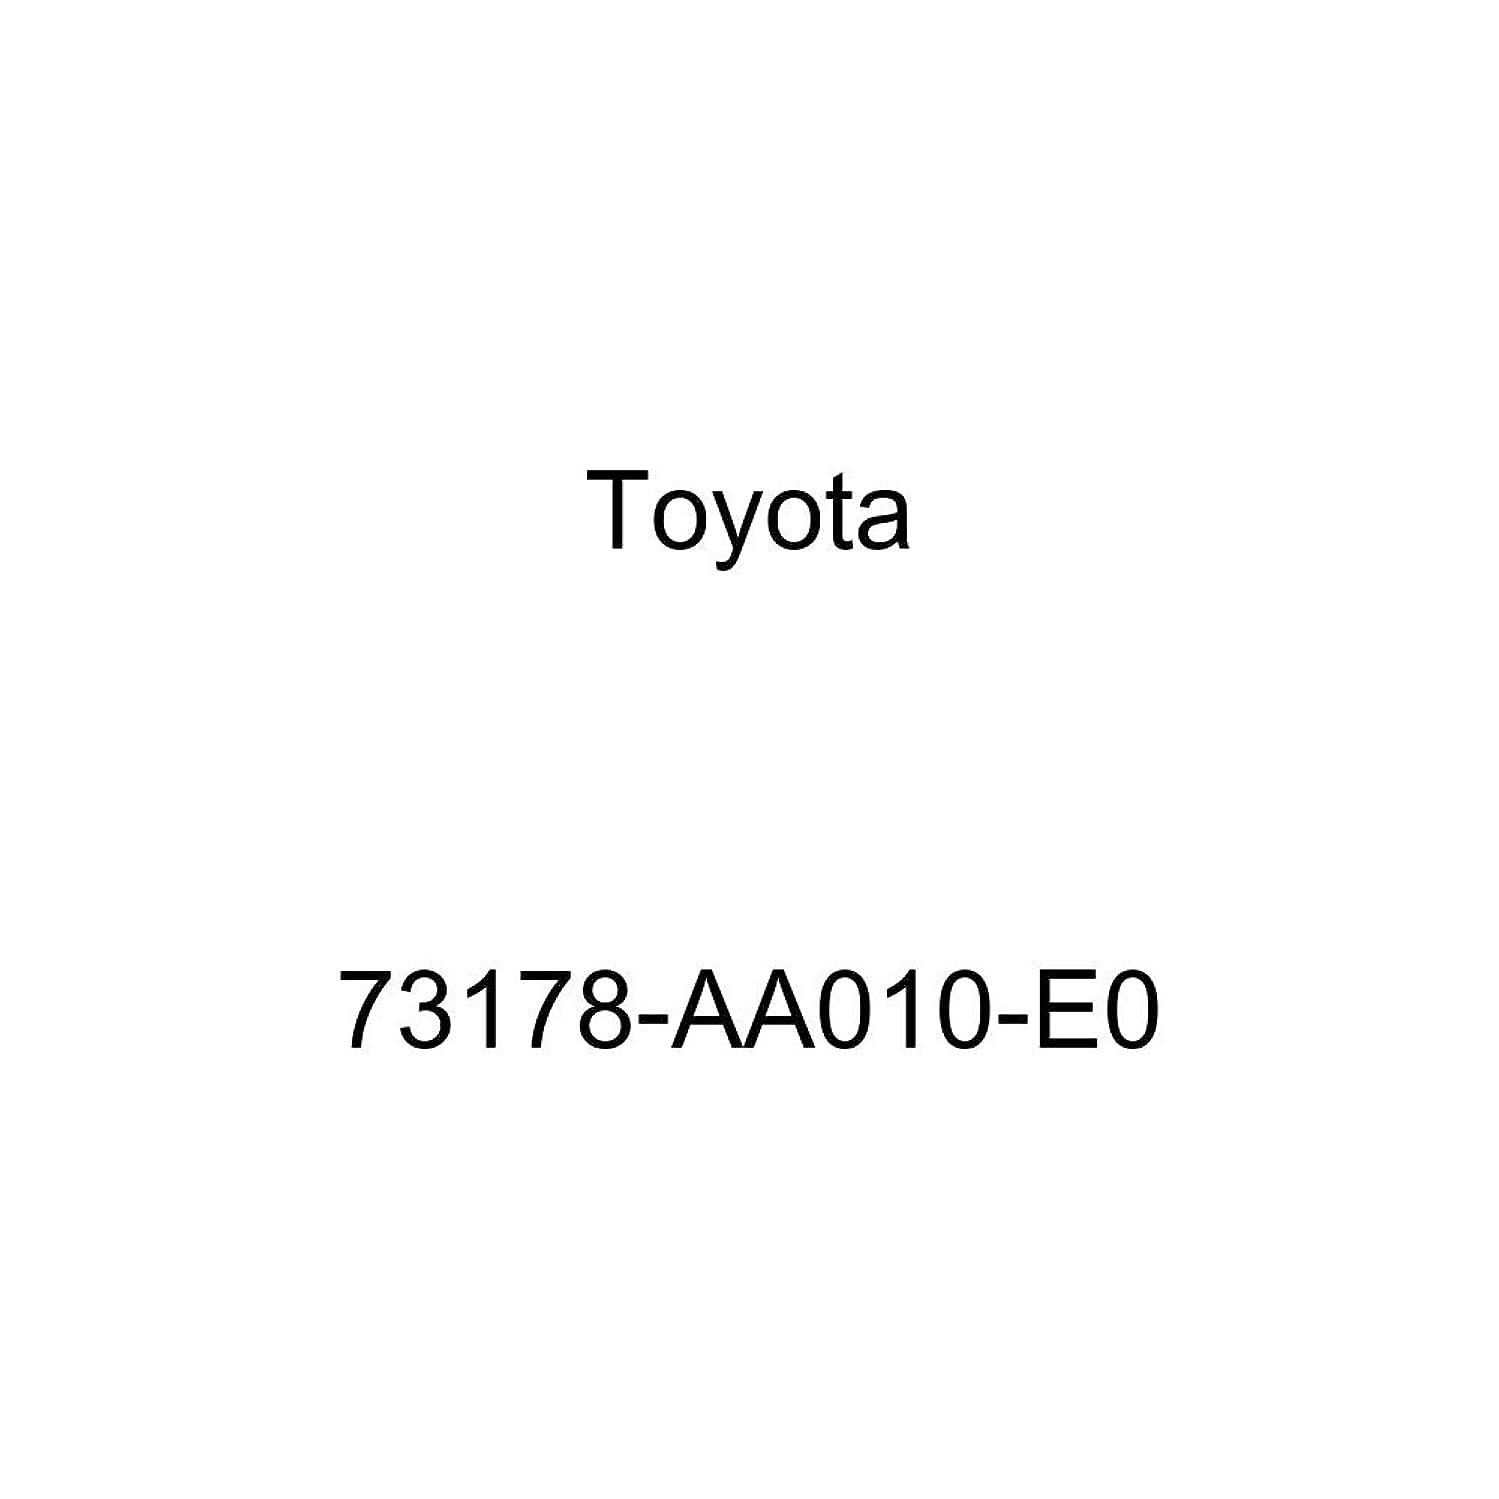 Genuine Toyota 73178-AA010-E0 Seat Belt Anchor Cover Cap